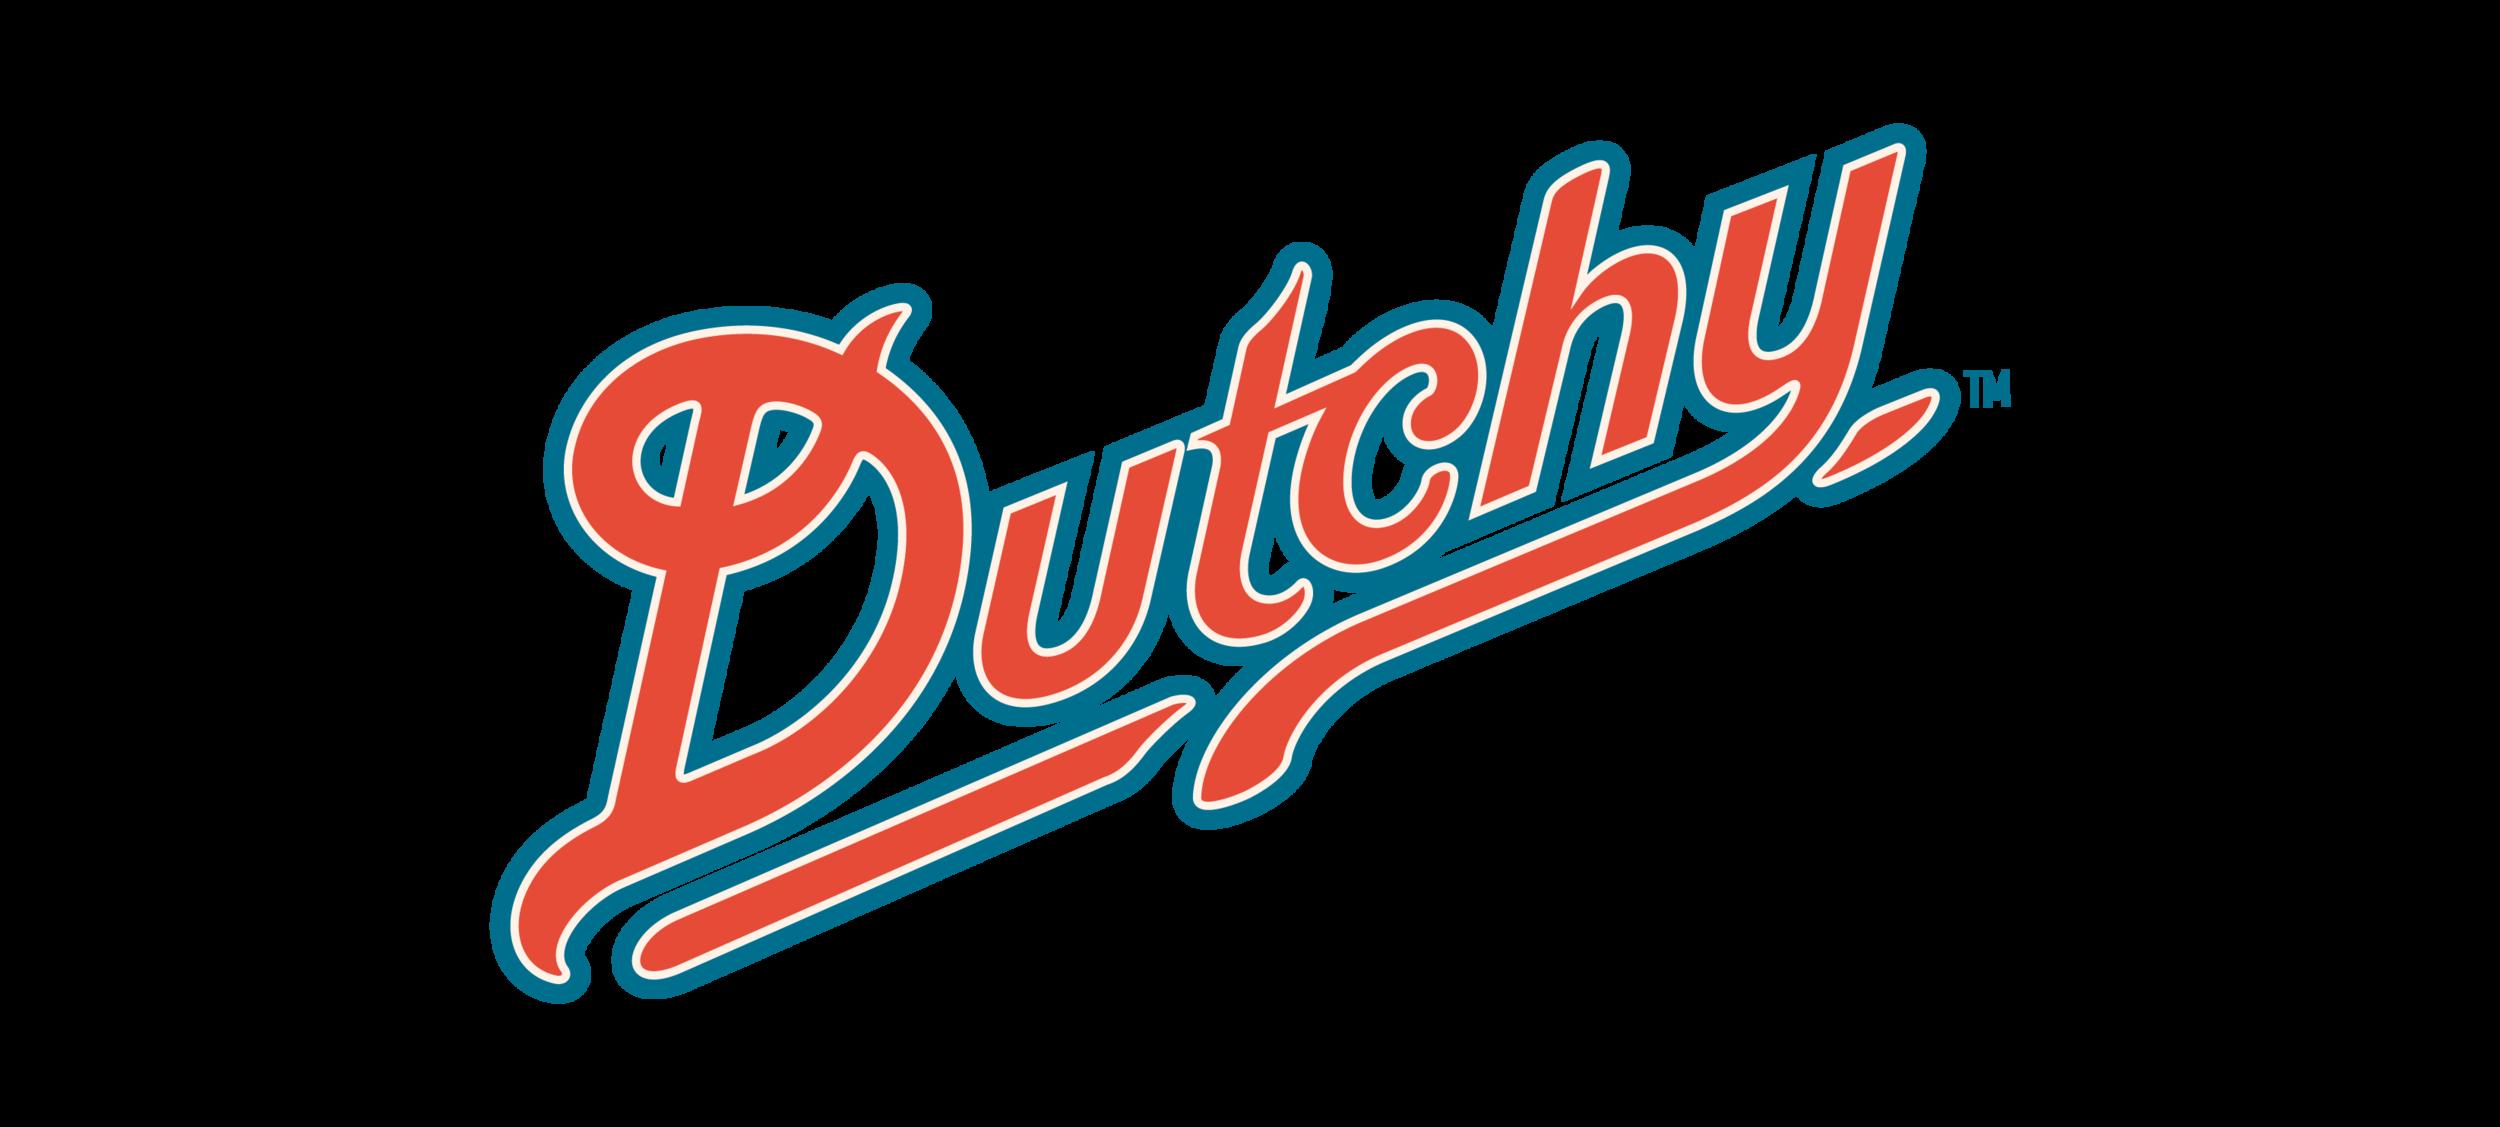 Dutchy logo-01.png